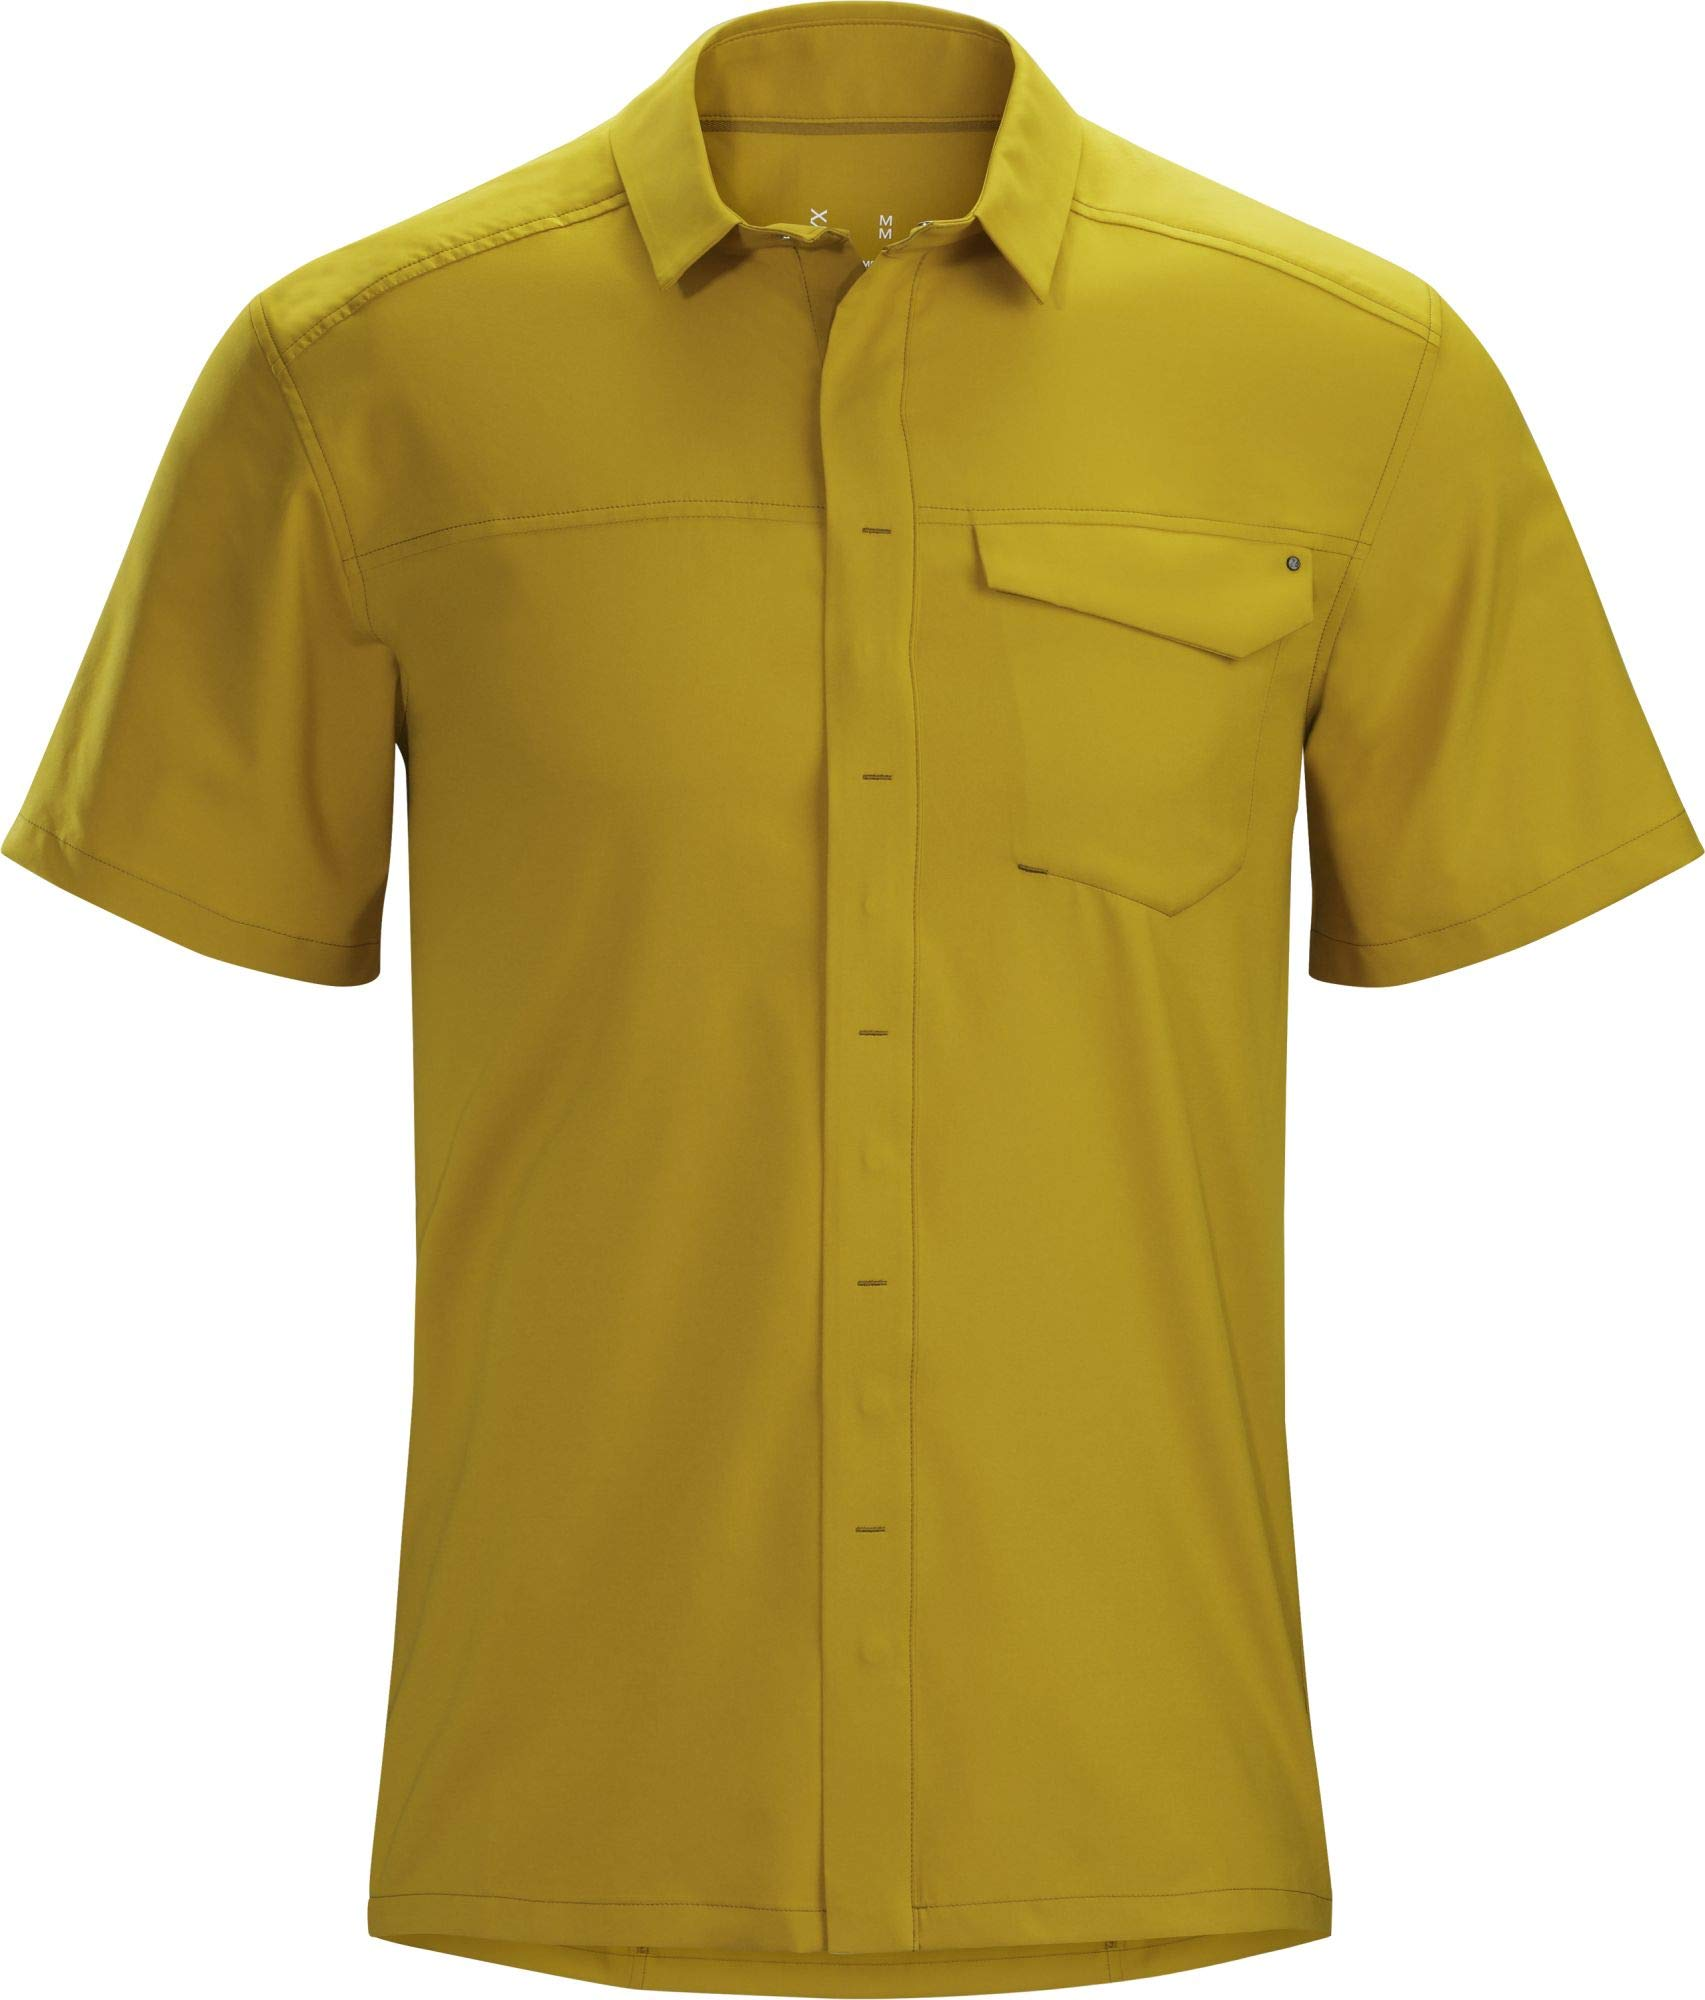 Arc'teryx Skyline SS Shirt - Men's Midnight Sun Small